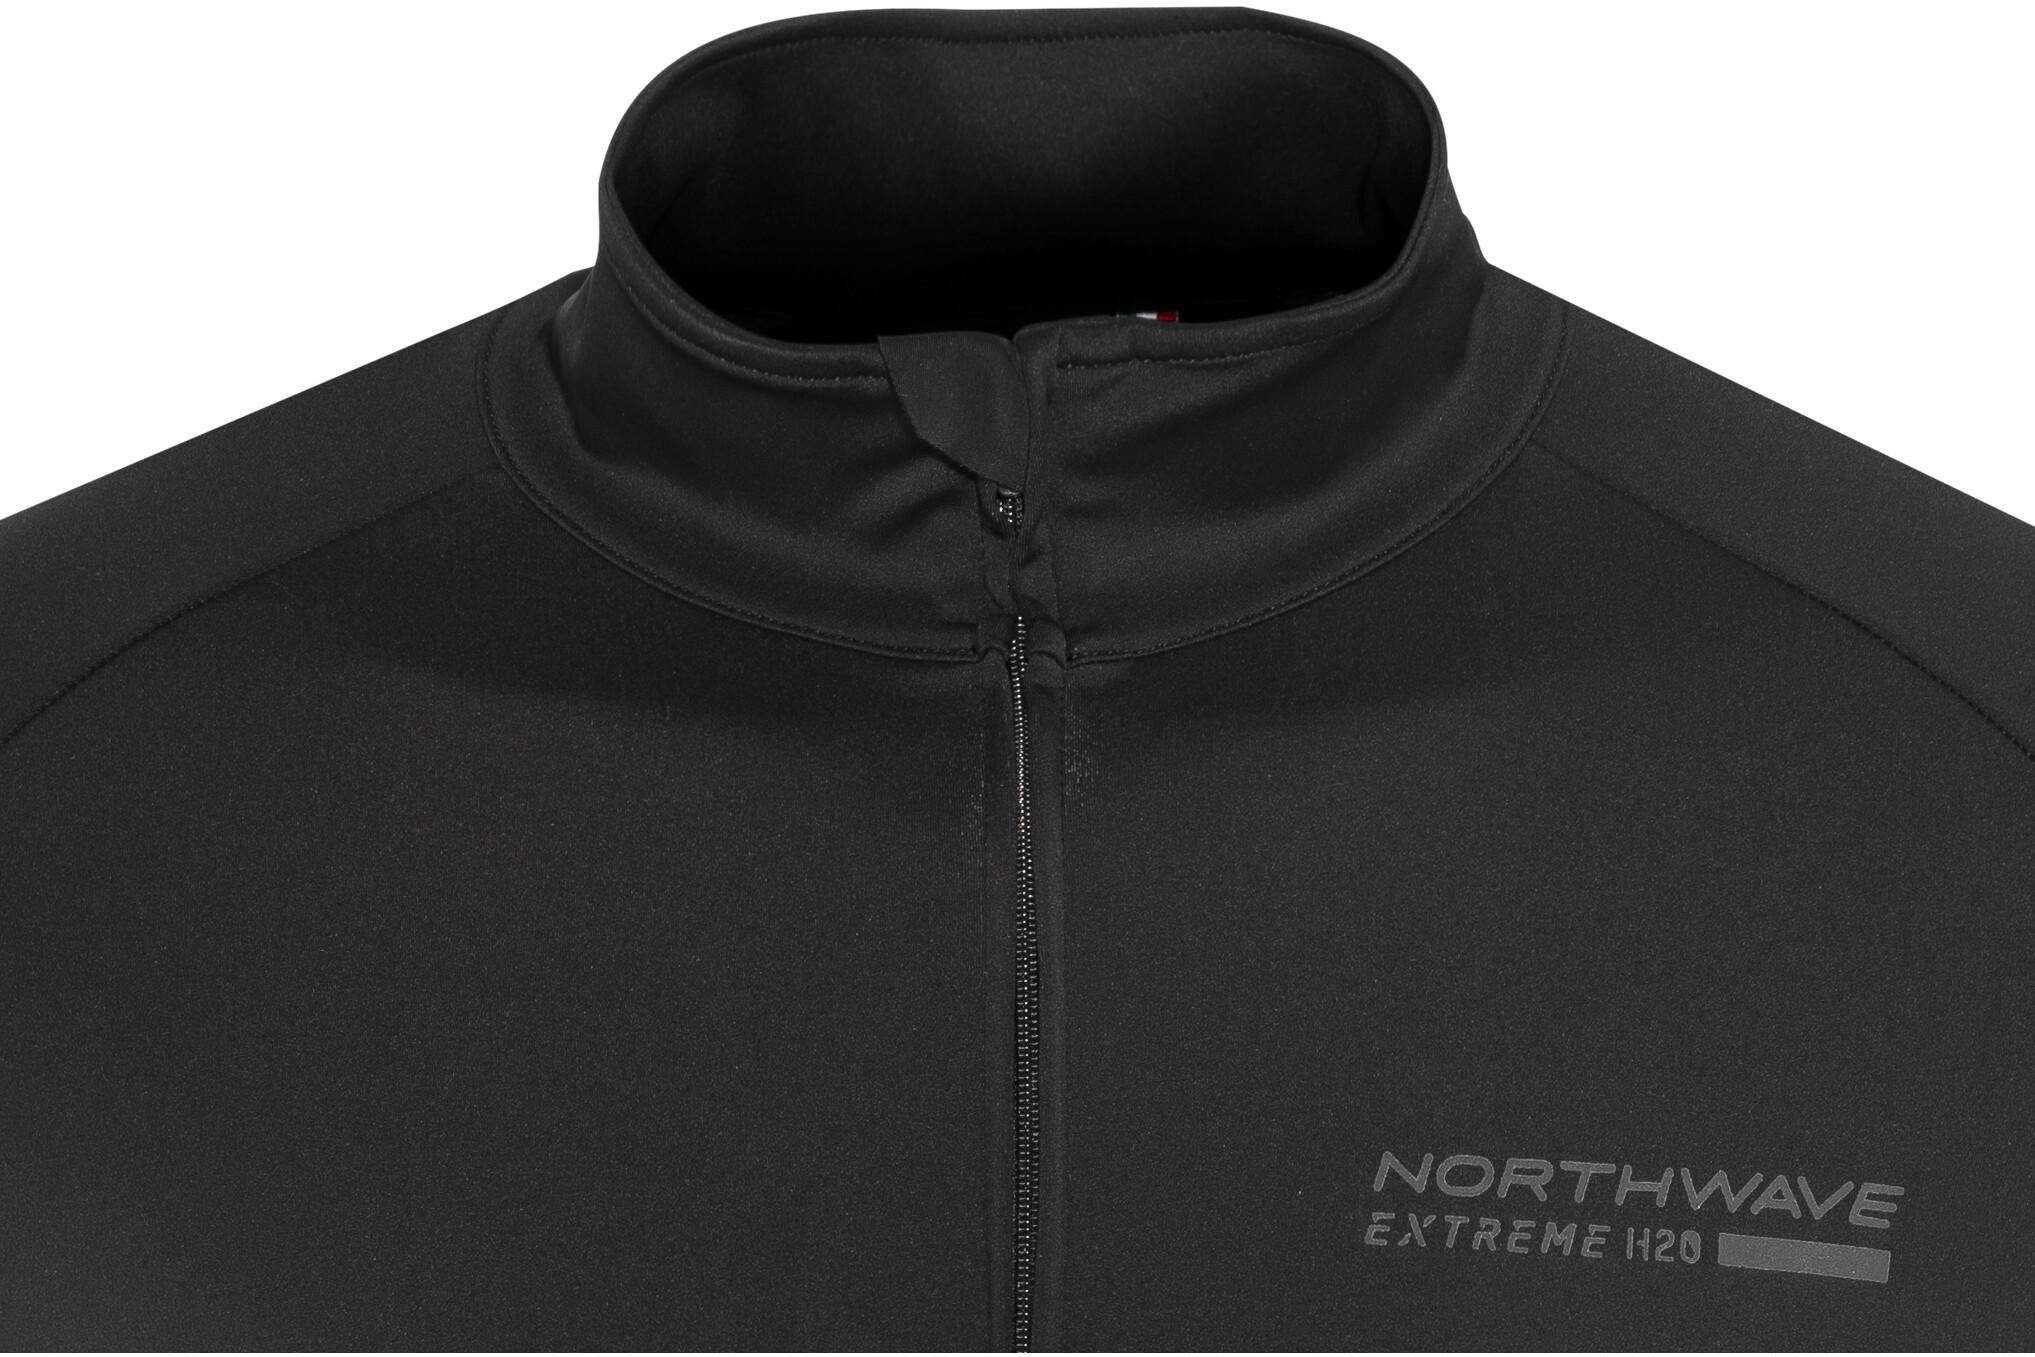 Northwave Extreme H2O Miehet takki  b79d7fa3a3